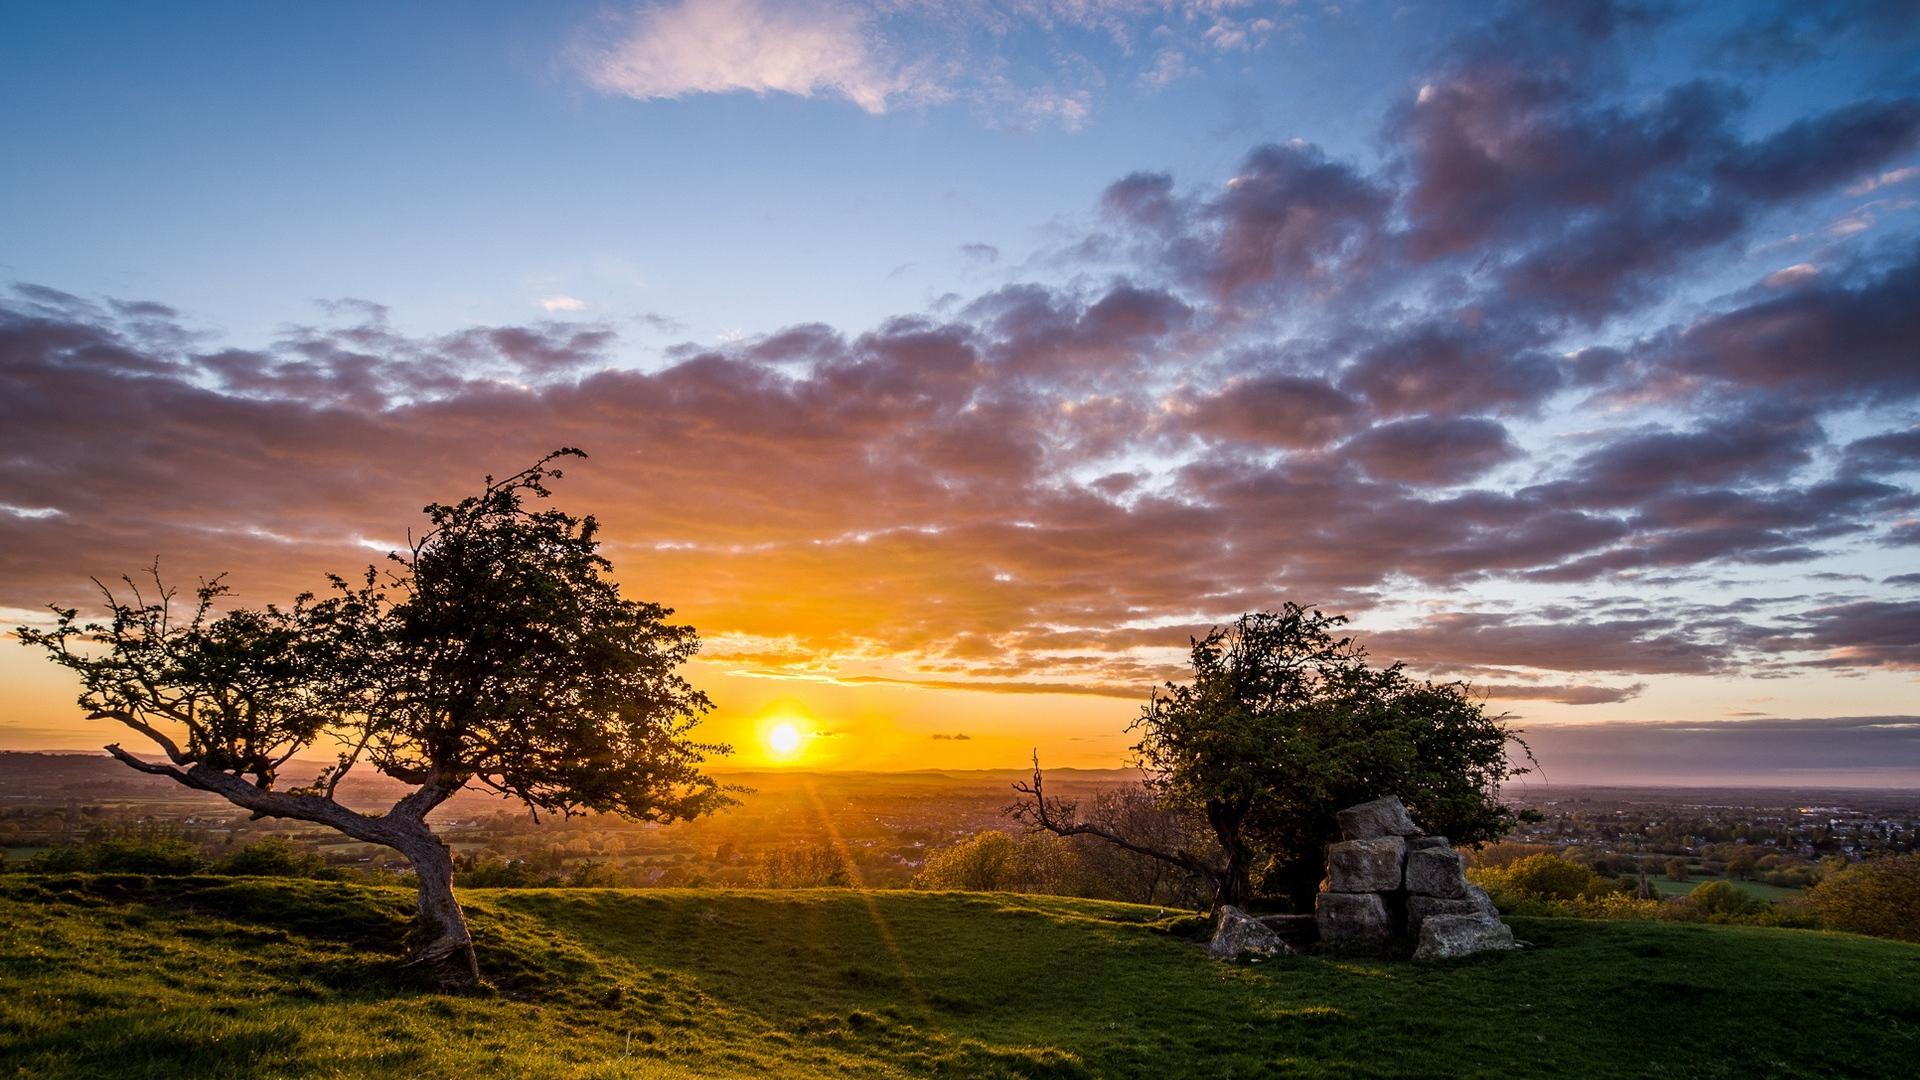 Natural Light Photography Landscape Wallpaper : natural li...